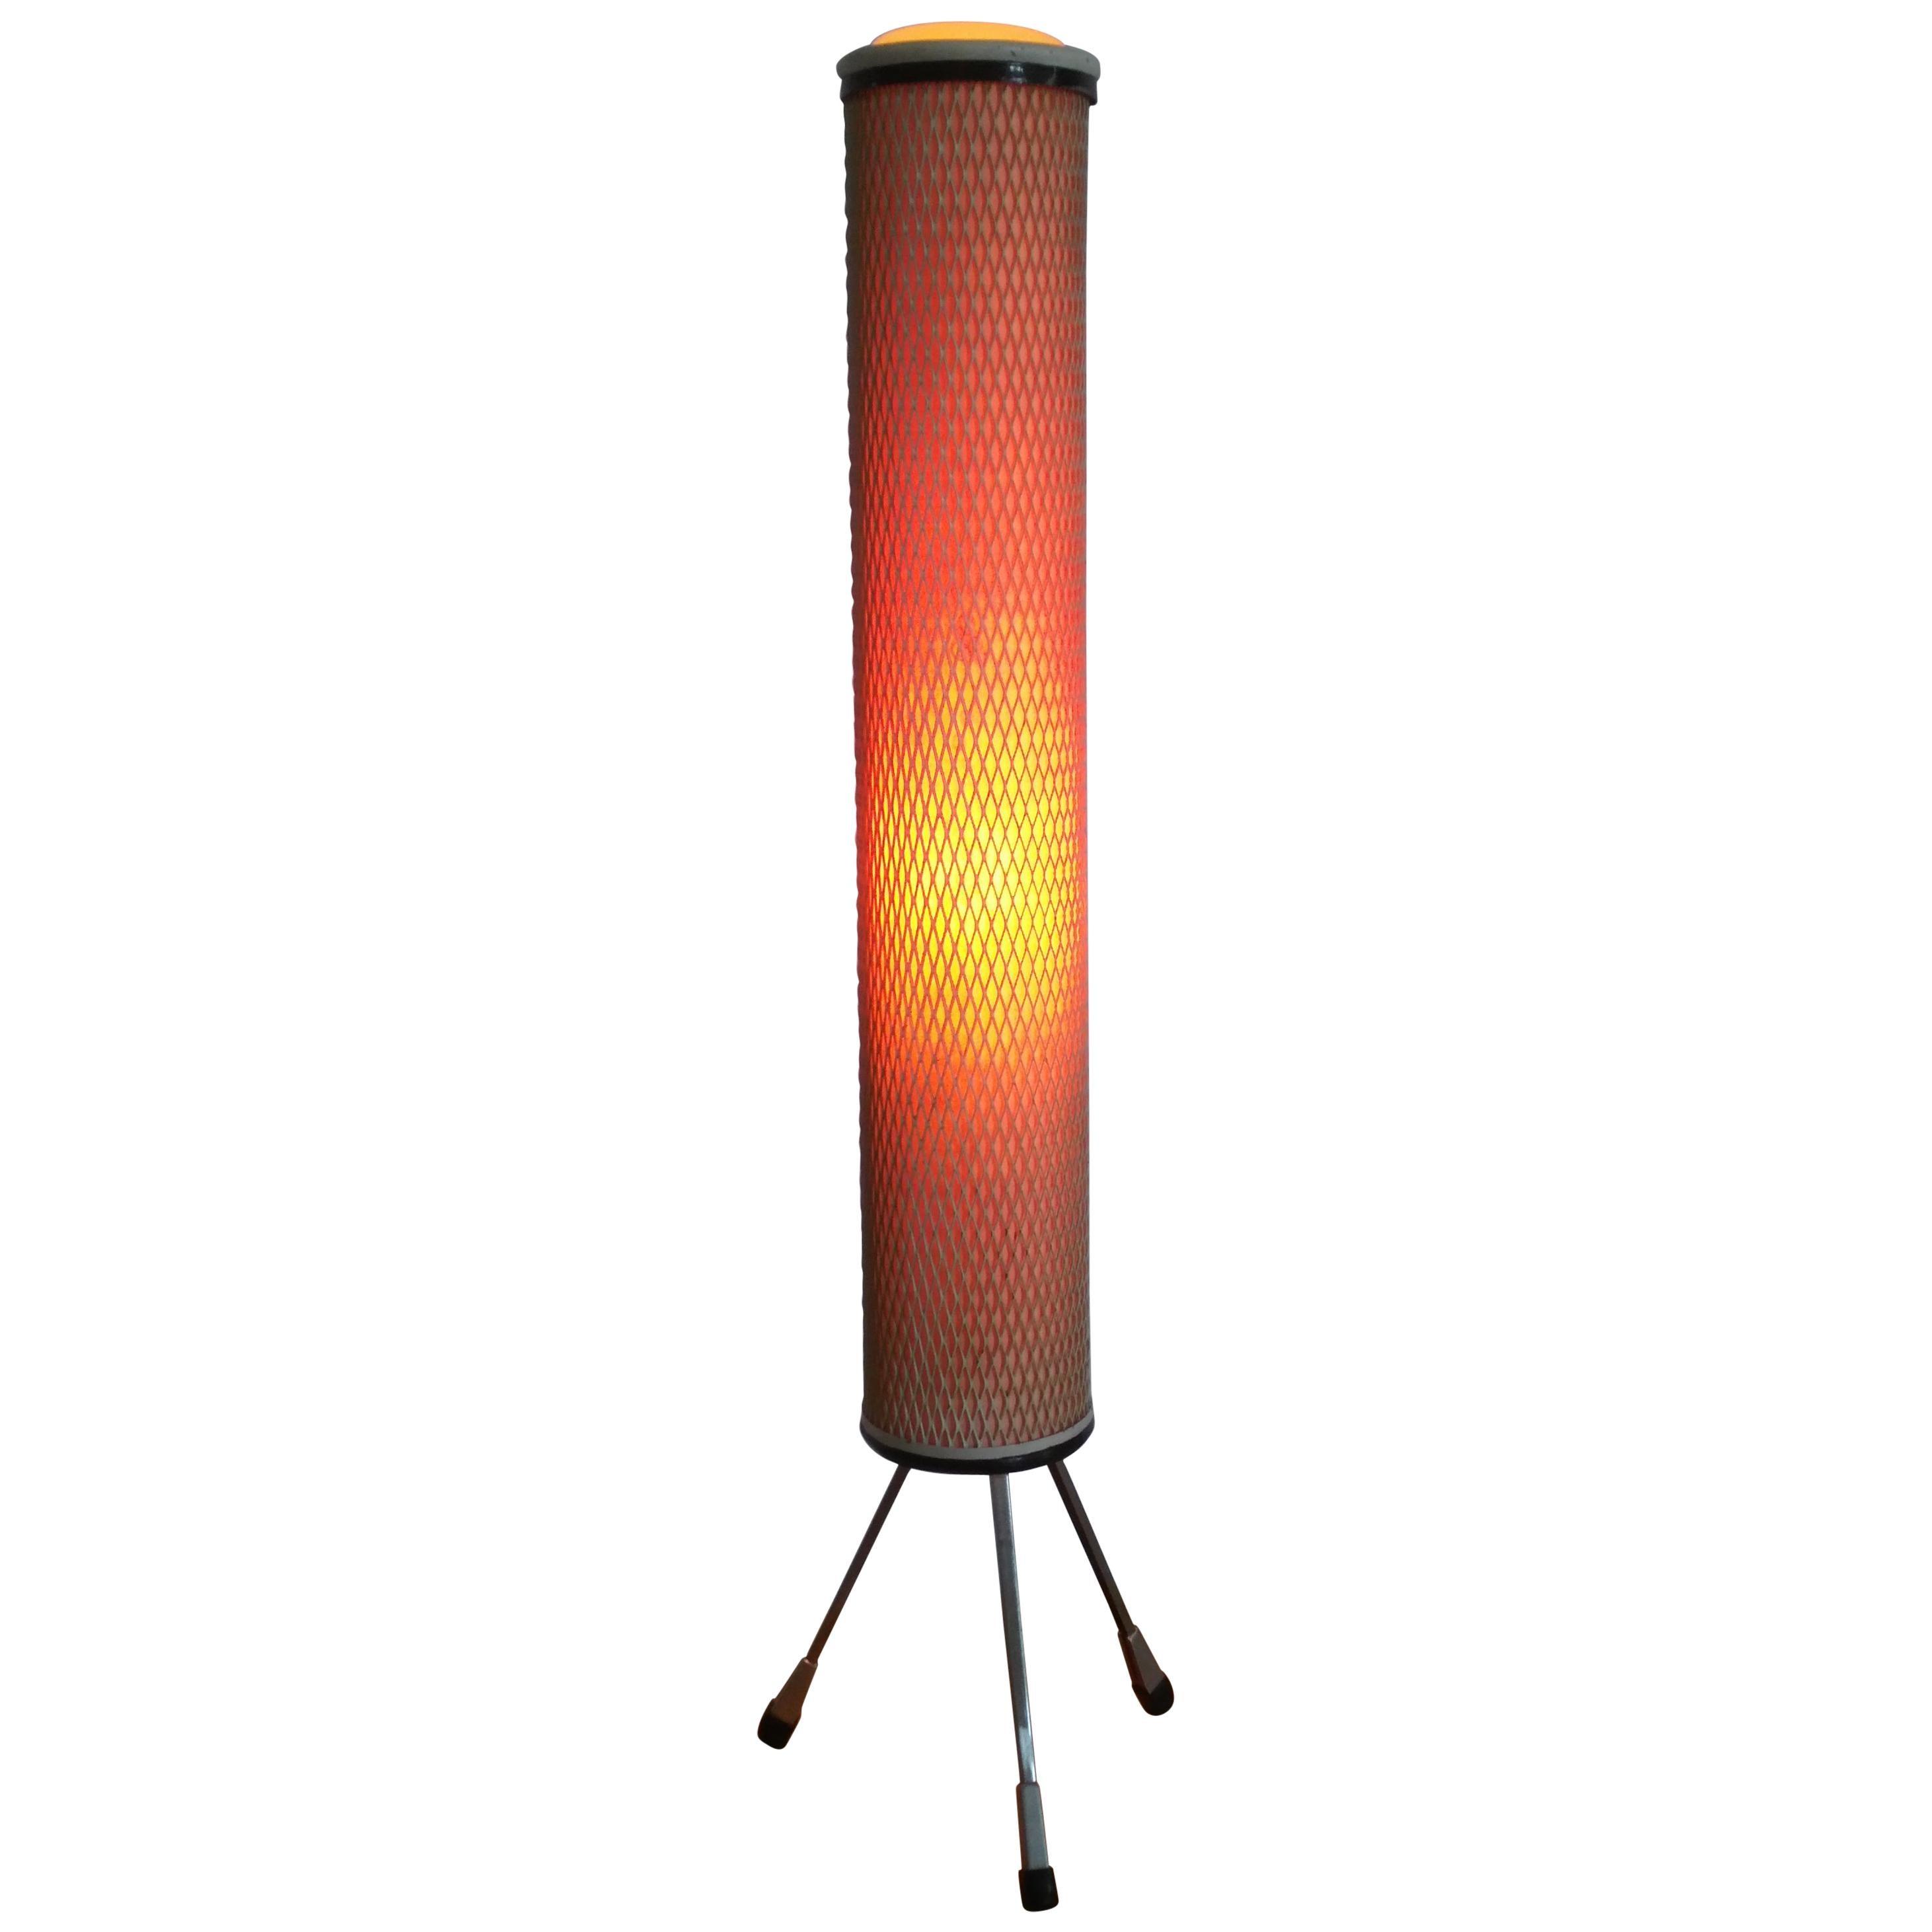 "Design Floor Space Age Lamp ""Rocket"", 1960s"